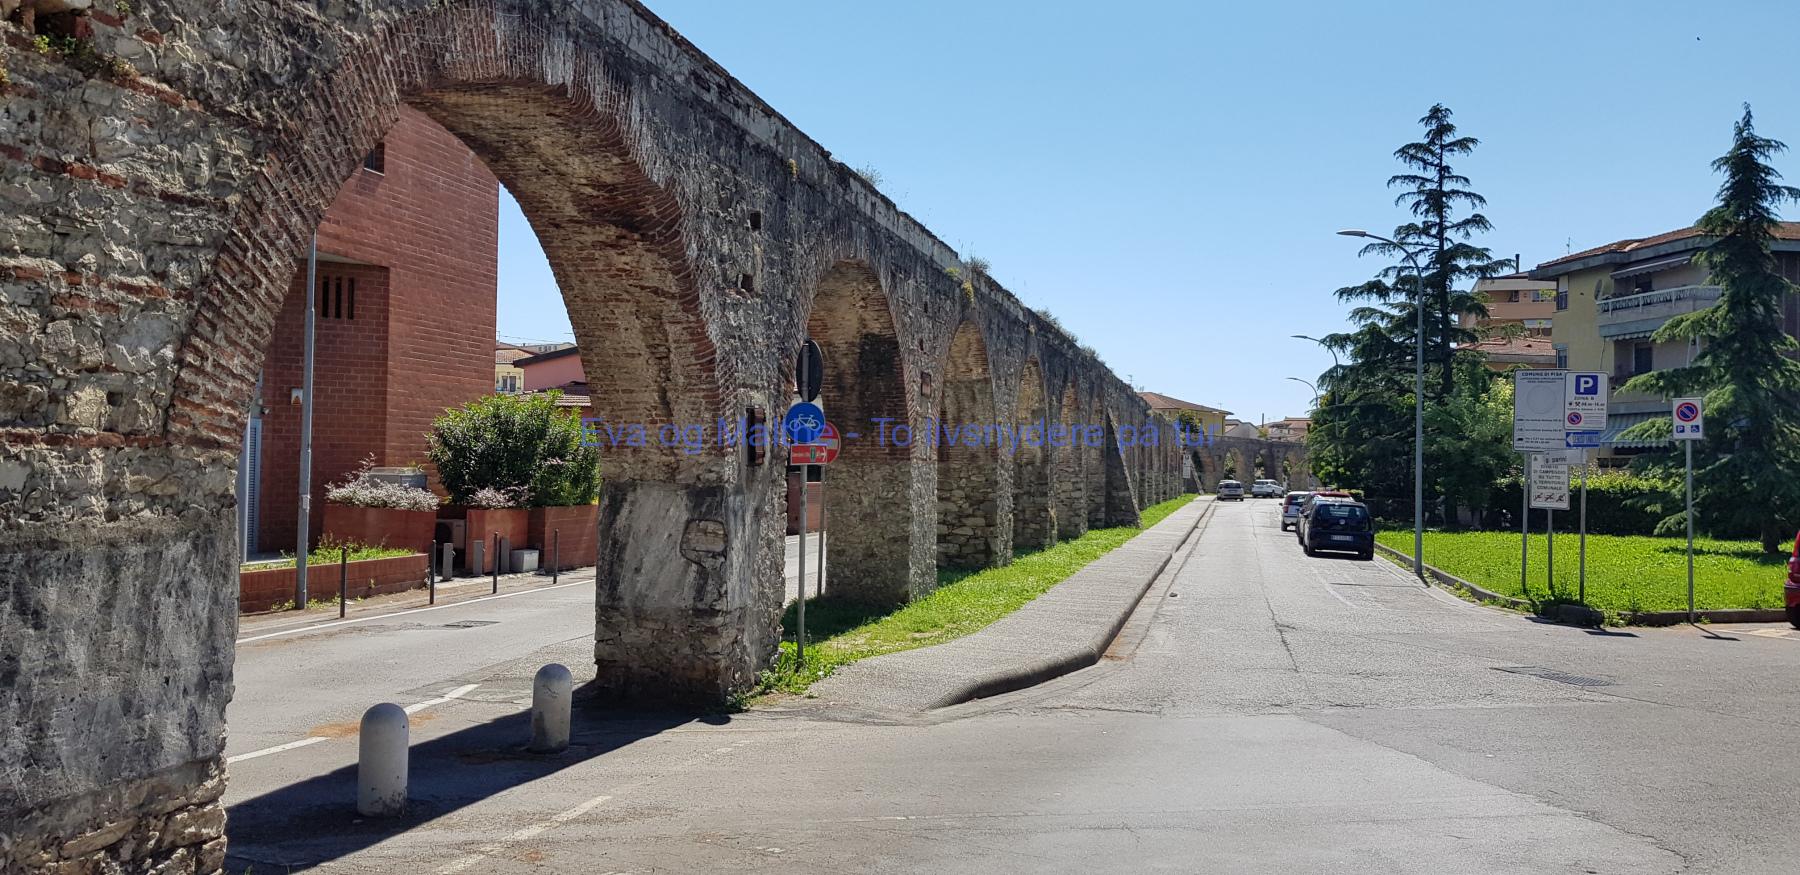 Piza-Italien-evaogmalthe.dk-Viadukt mod Piza